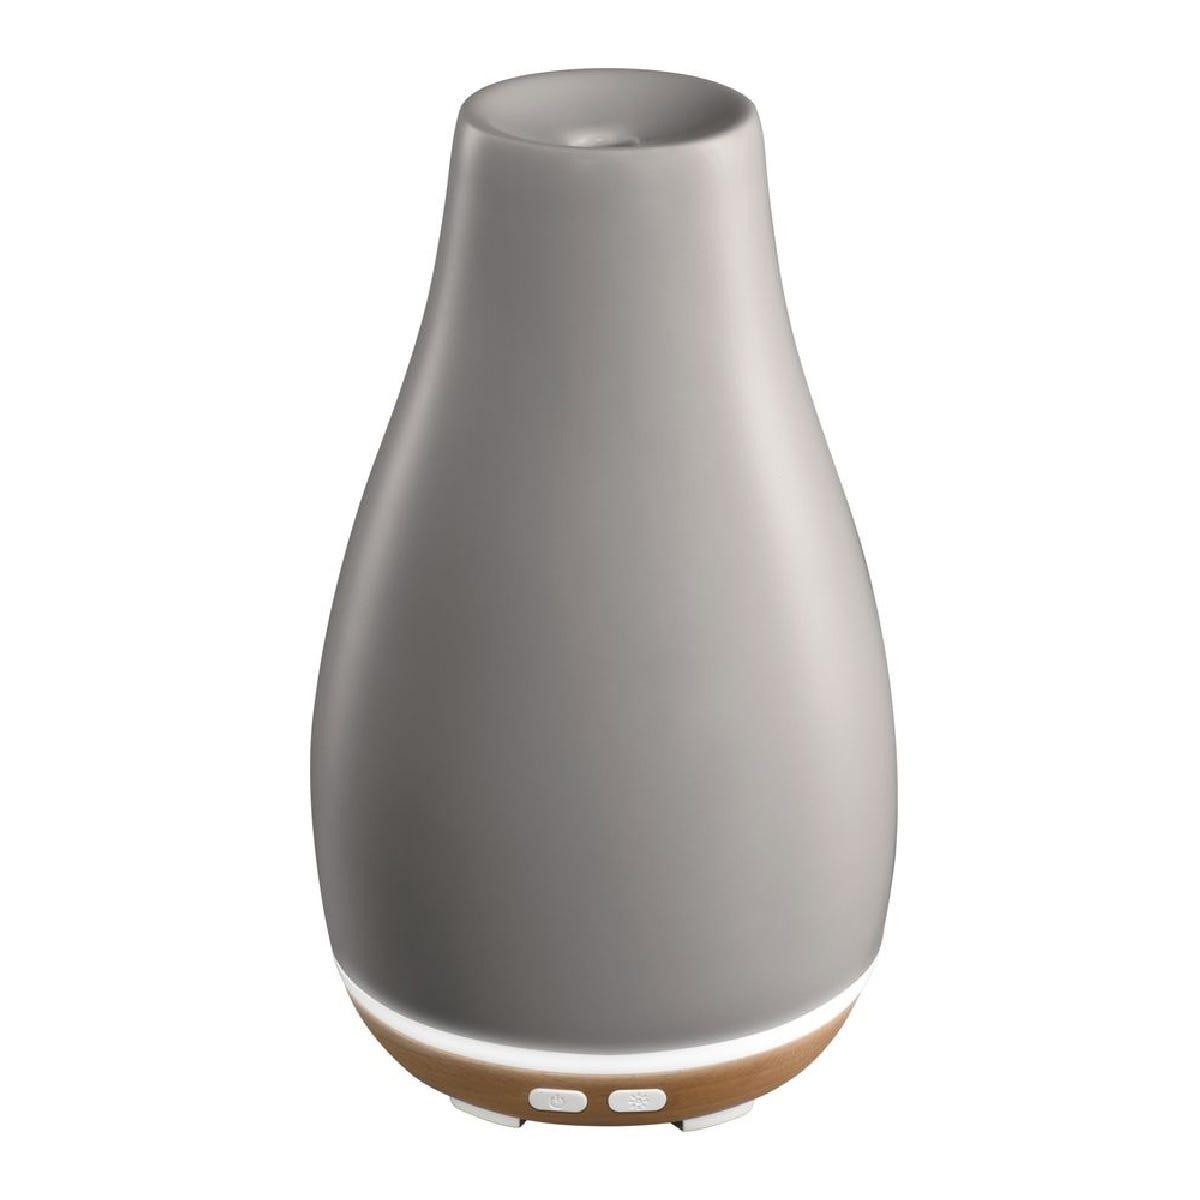 Ellia Blossom Ultrasonic Essential Oil Diffuser - Grey